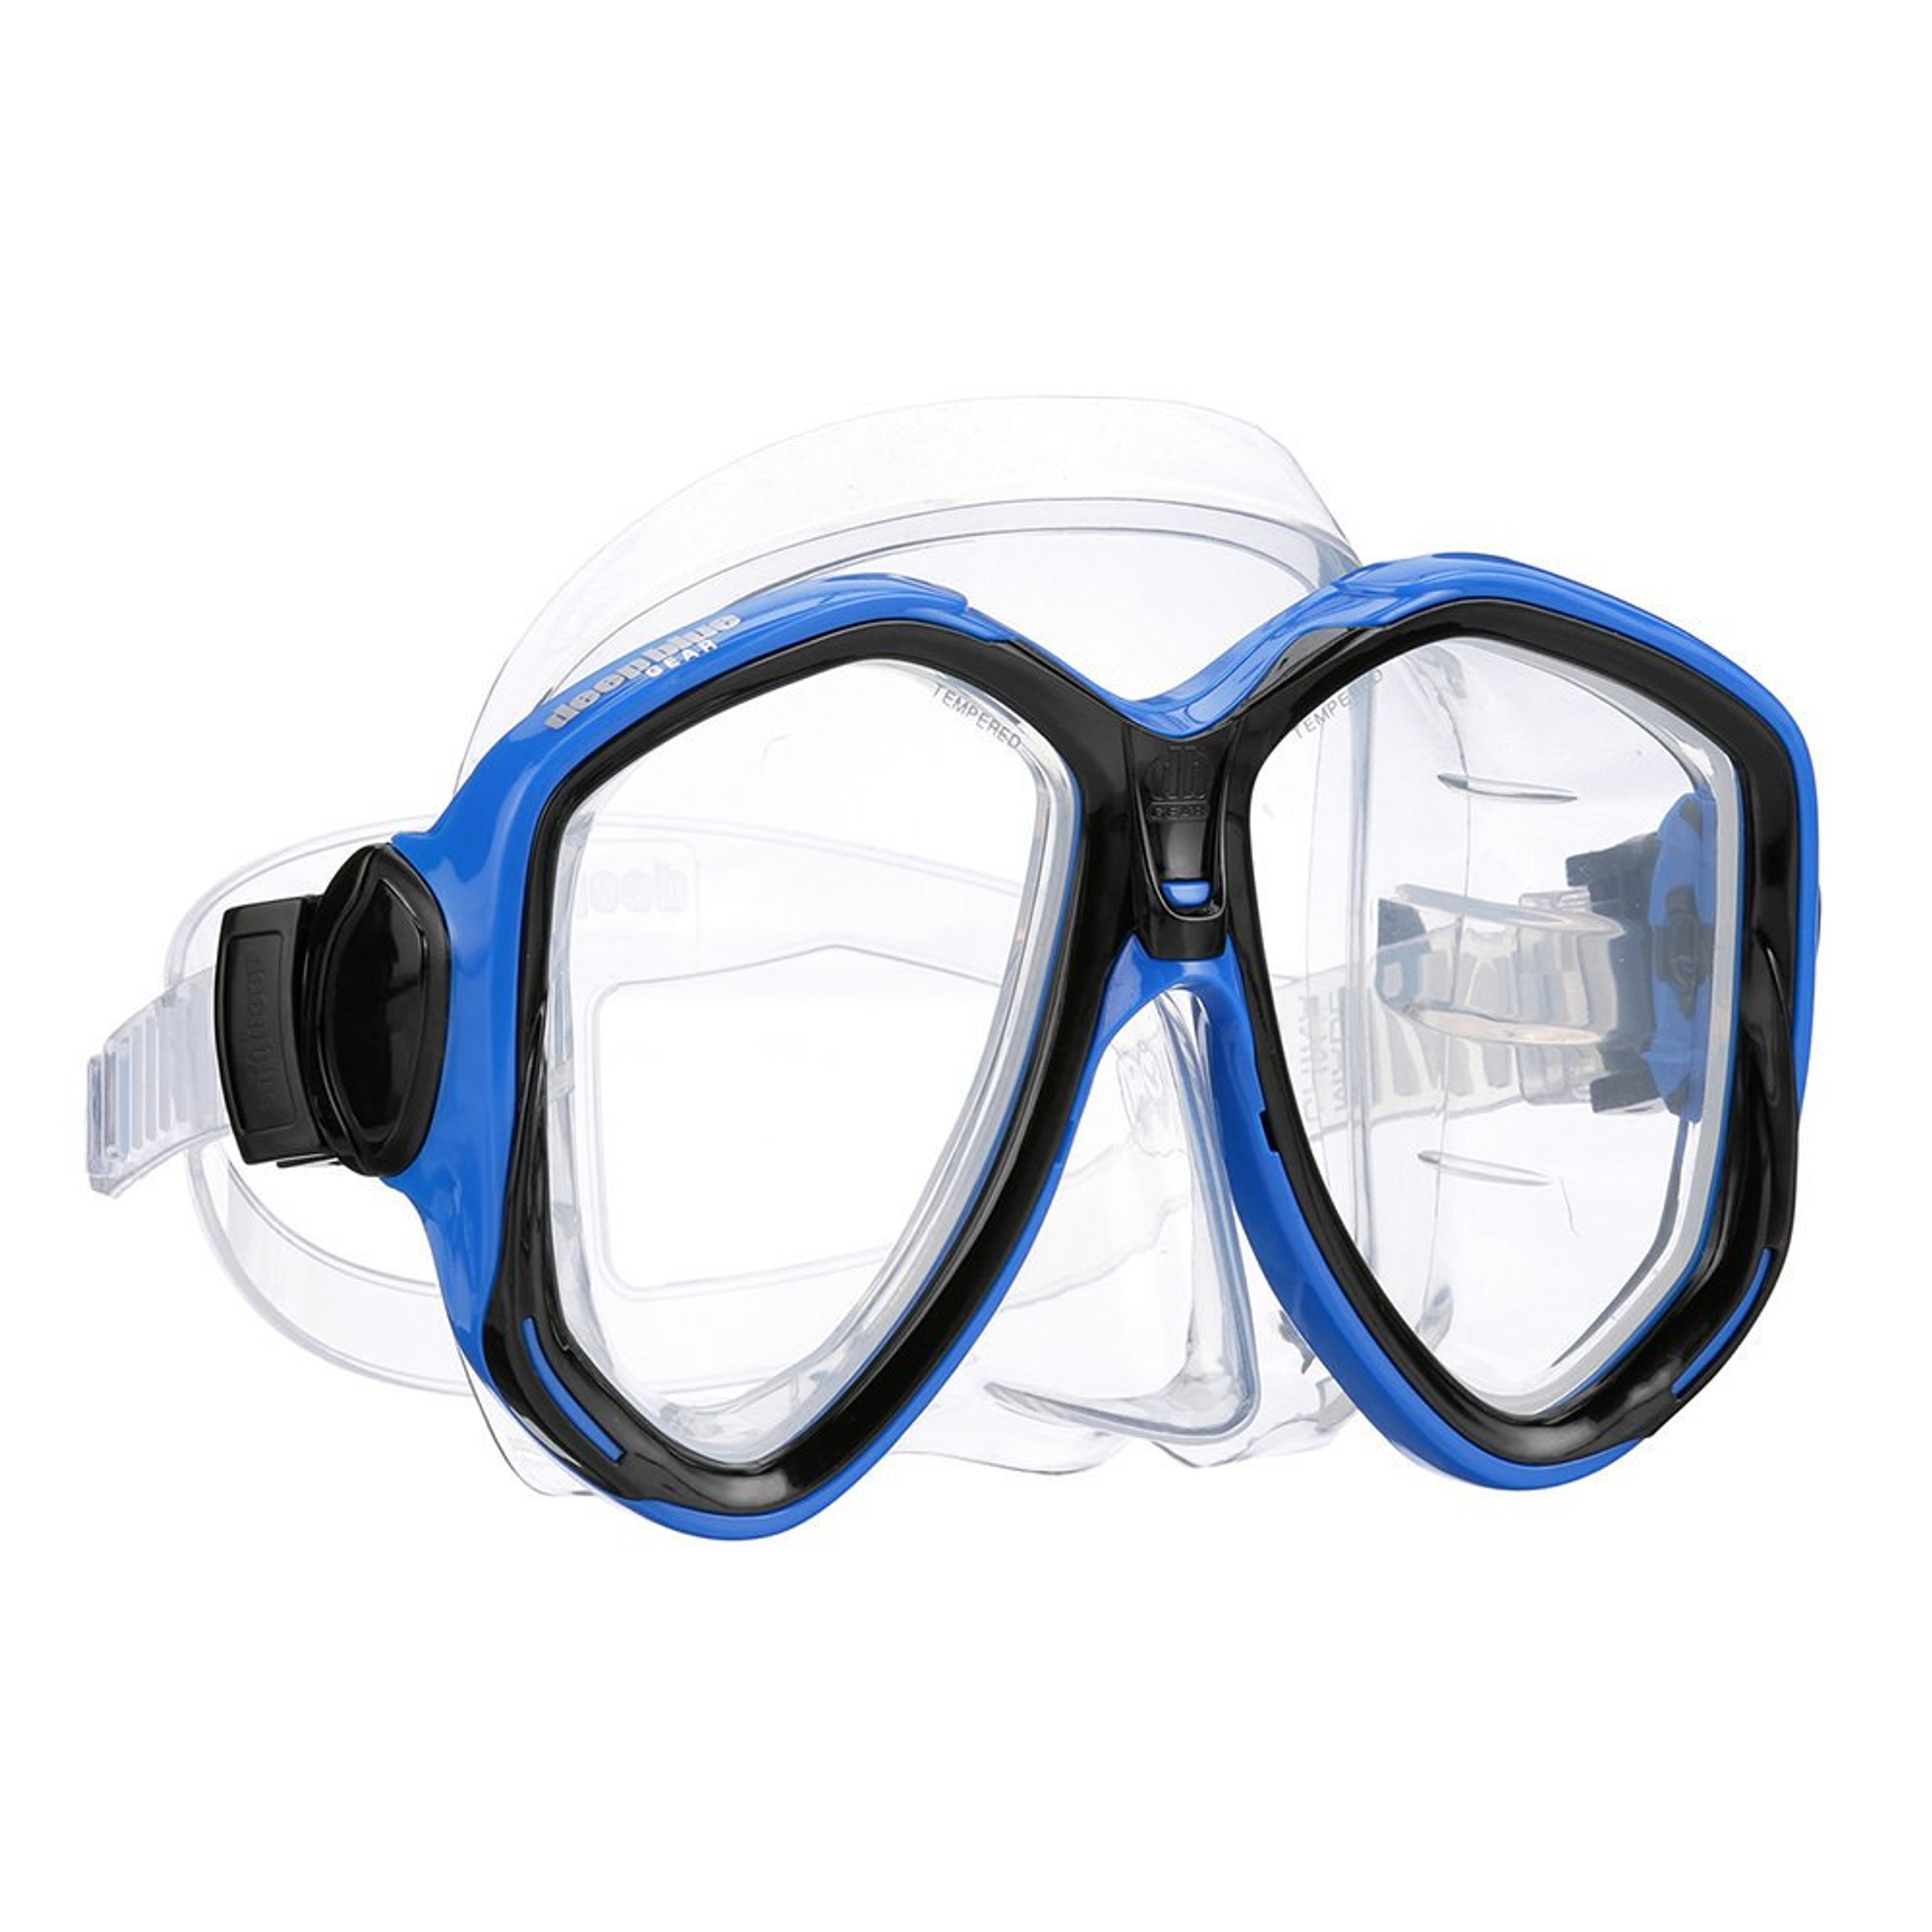 Super Vue 2 - Prescription Diving/Snorkeling Mask